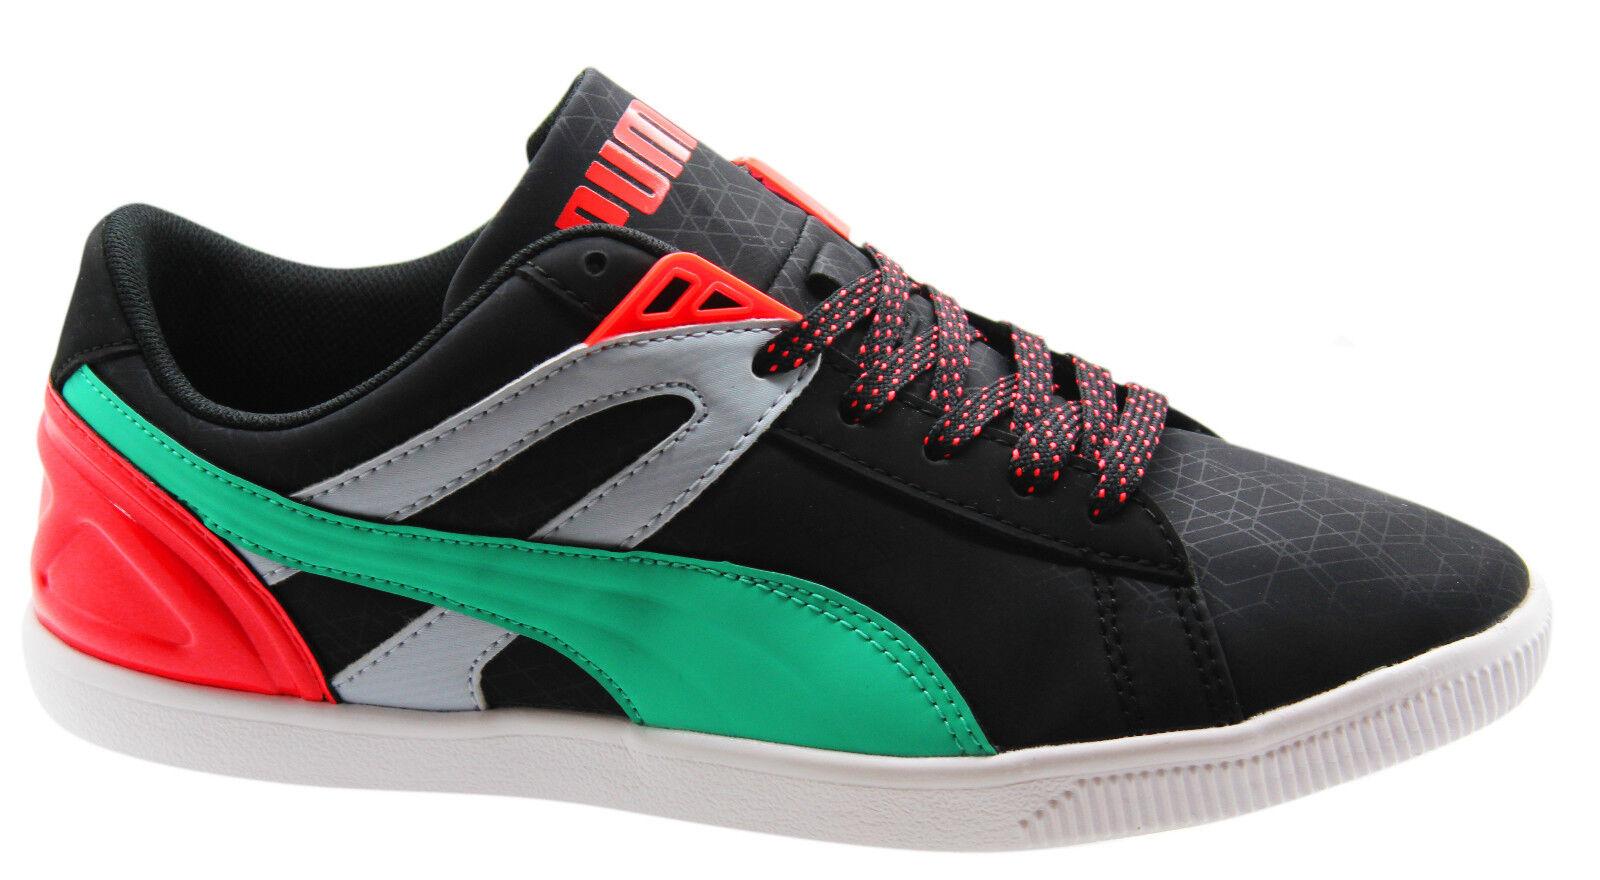 Puma future glyde lite lo femme trainers low top lacets unisexe 355615 01 wh